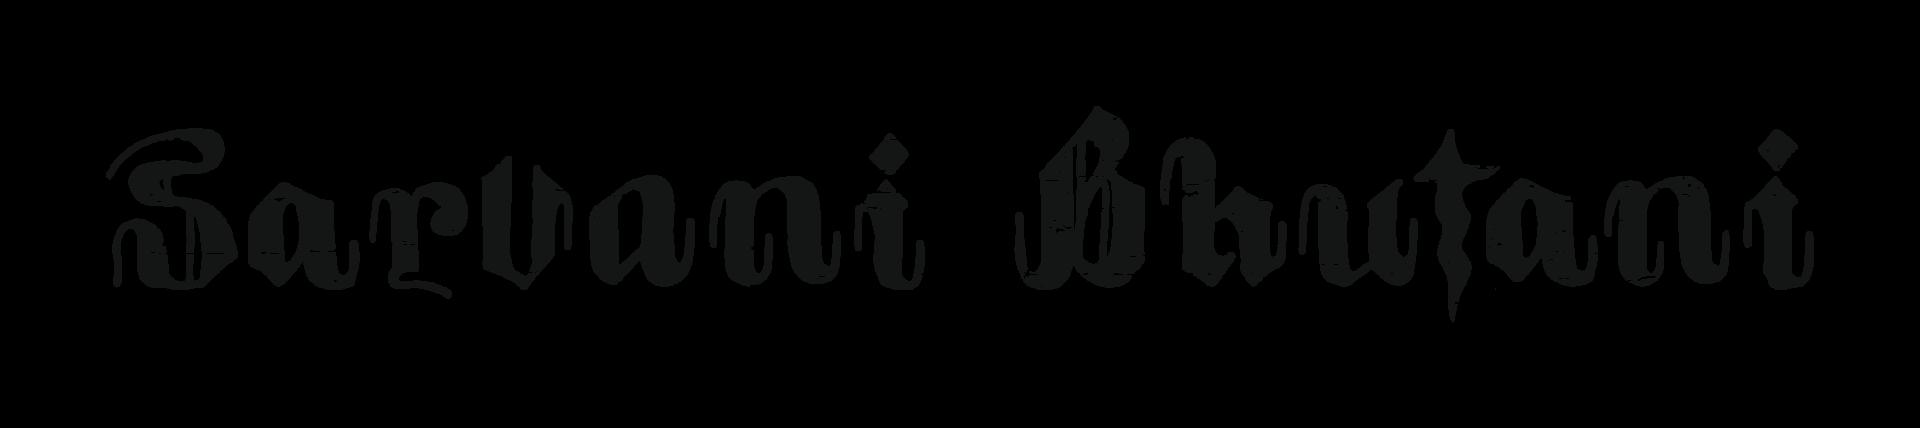 Sarvani Bhutani_Graphics_Logotype_01